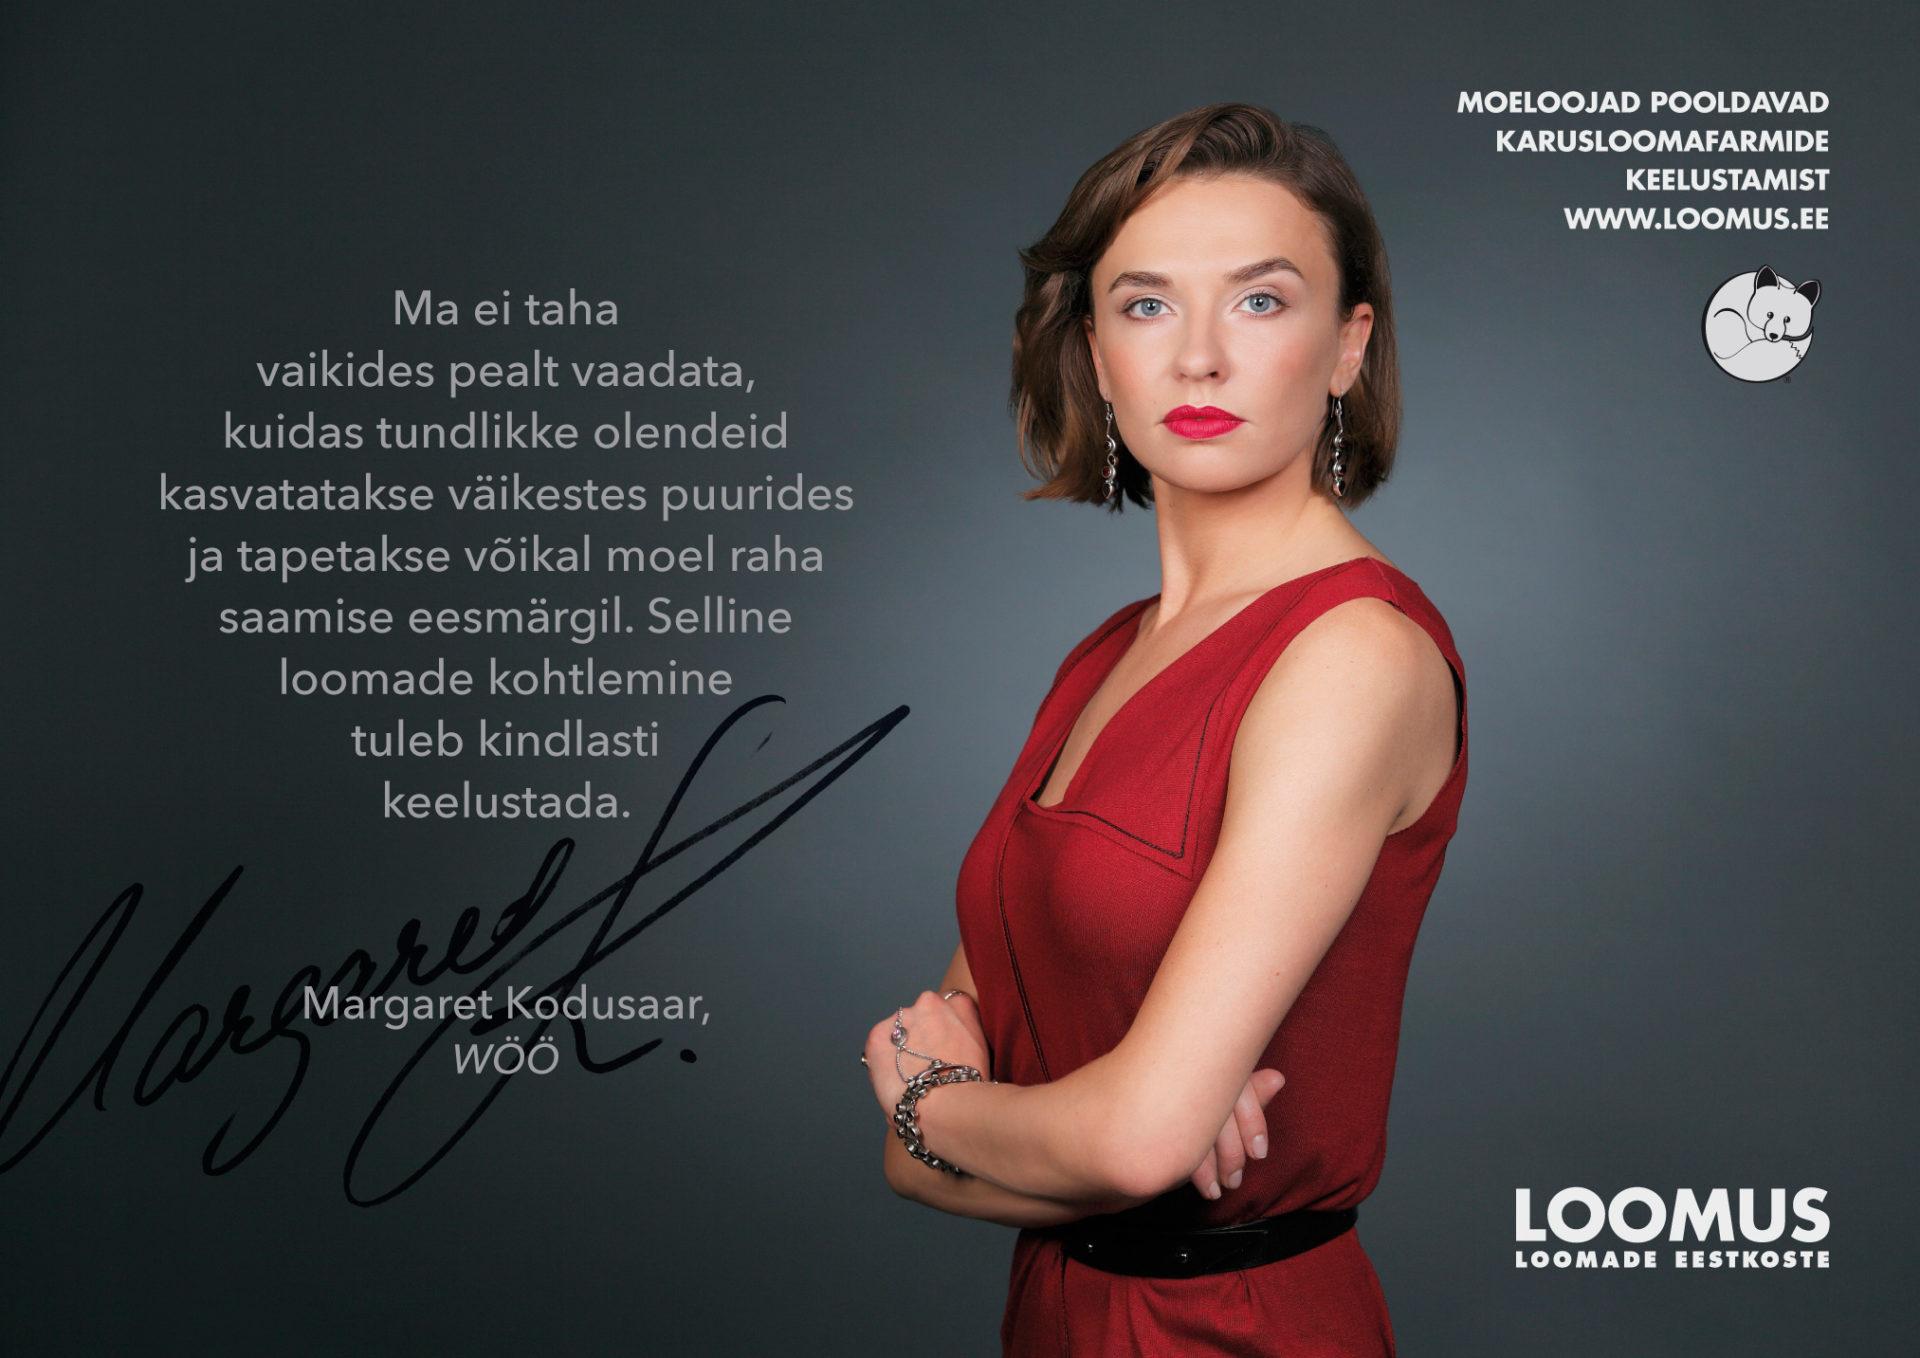 Margaret Kodusaar